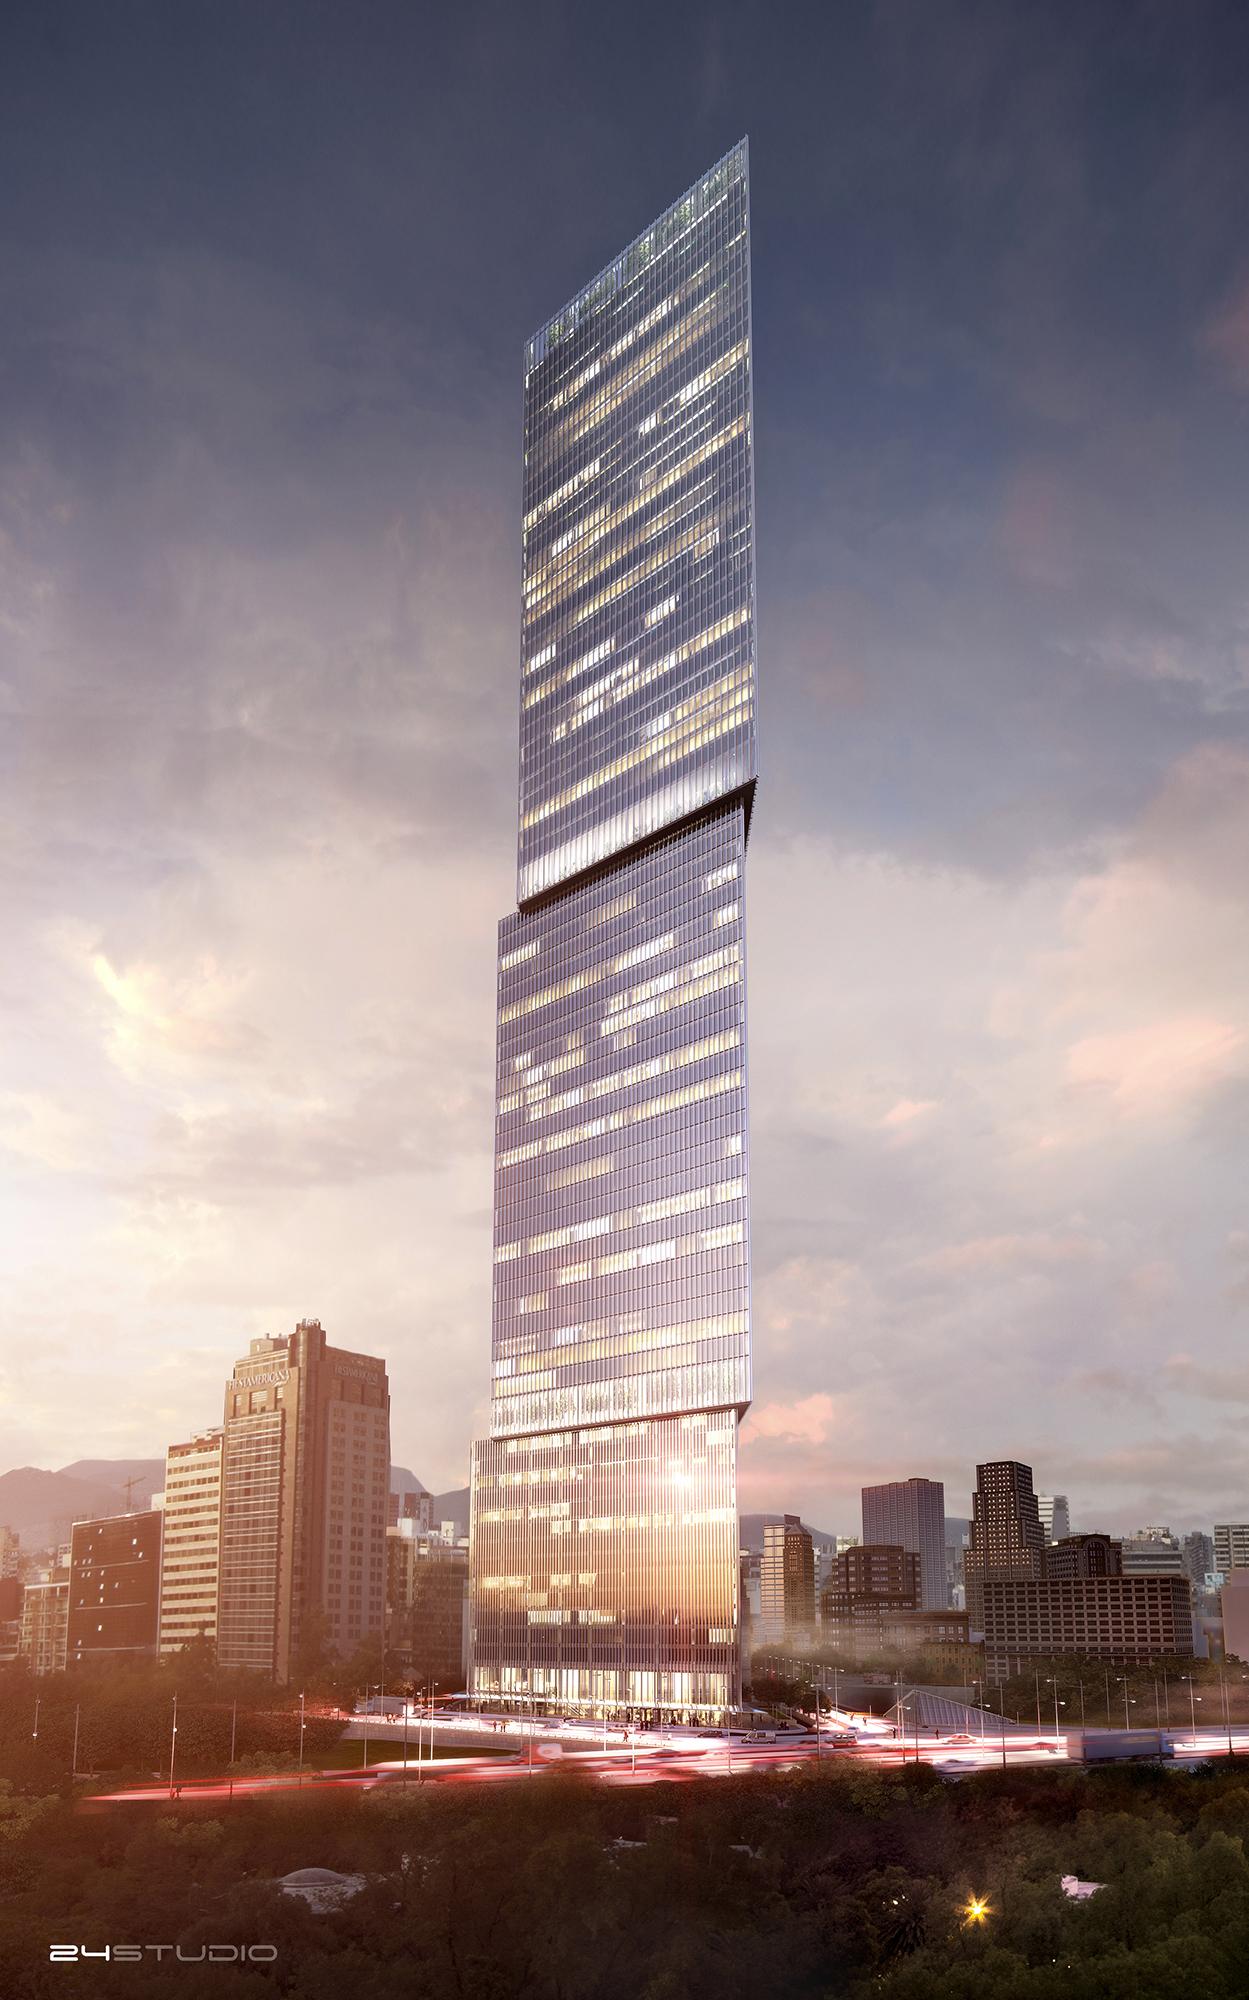 24studio-fernando-romero-reforma-tower_02.jpg